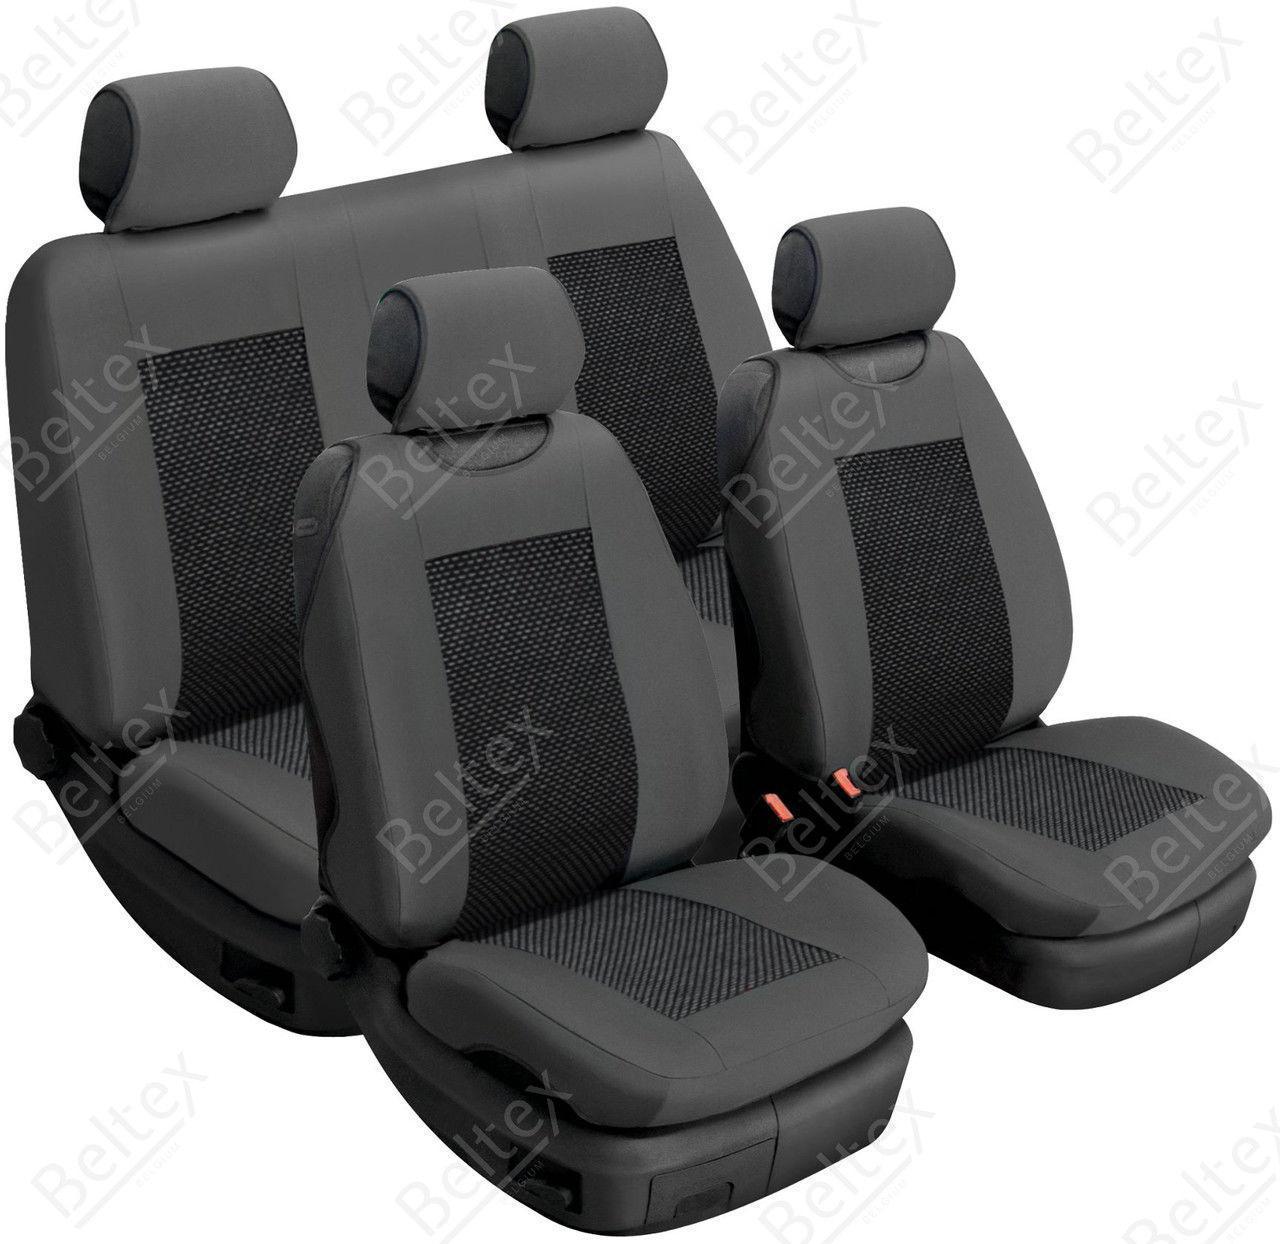 Майки/чехлы на сиденья Ауди А4 Б6 (Audi A4 B6)